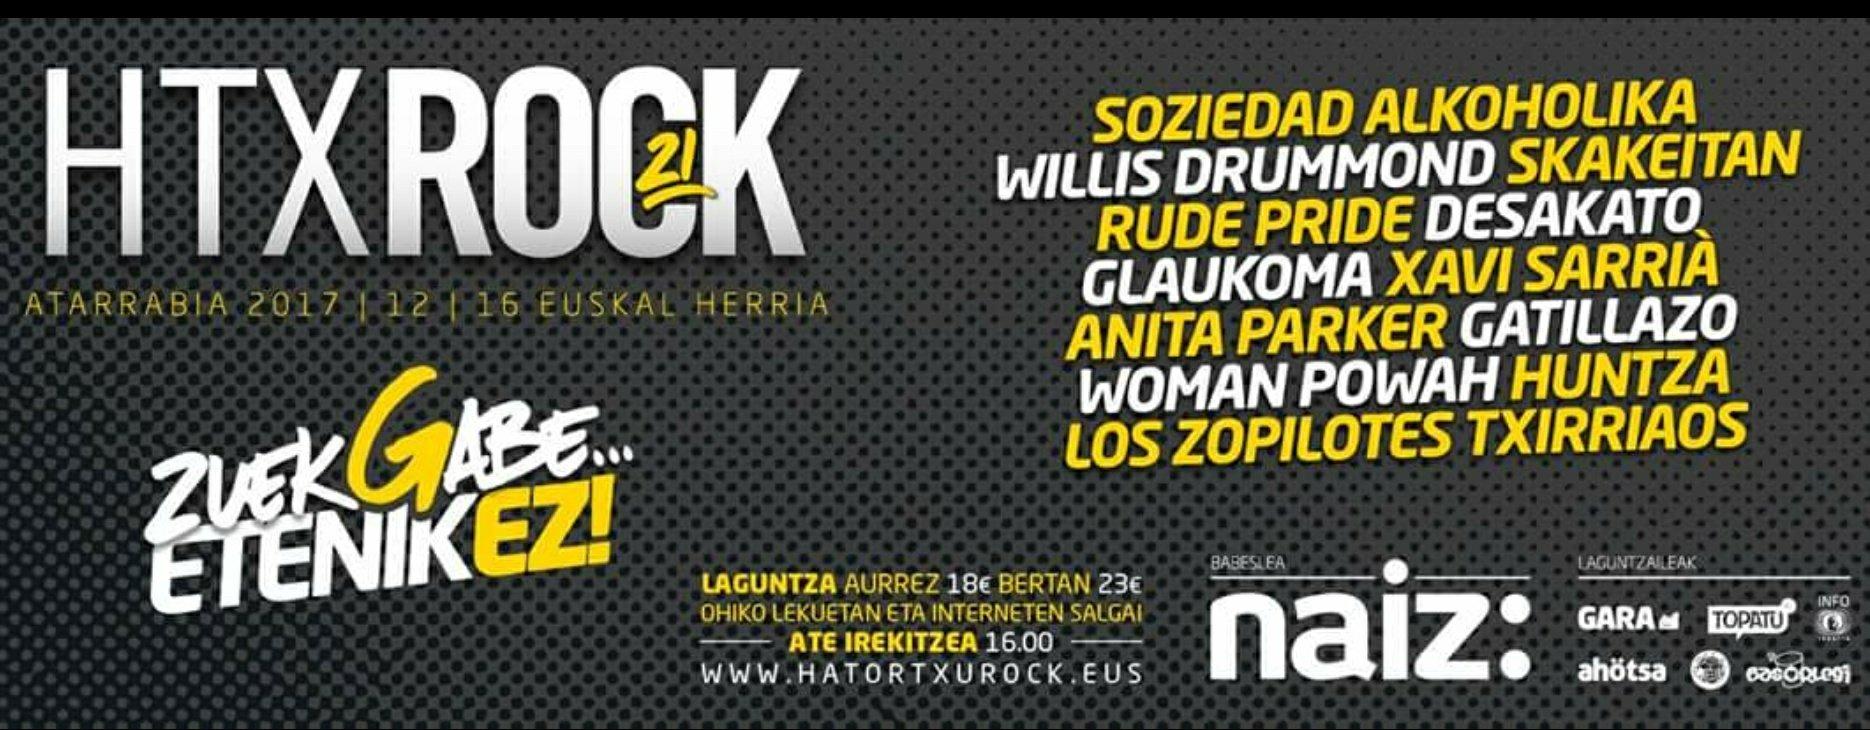 Hatortxu Rock 21